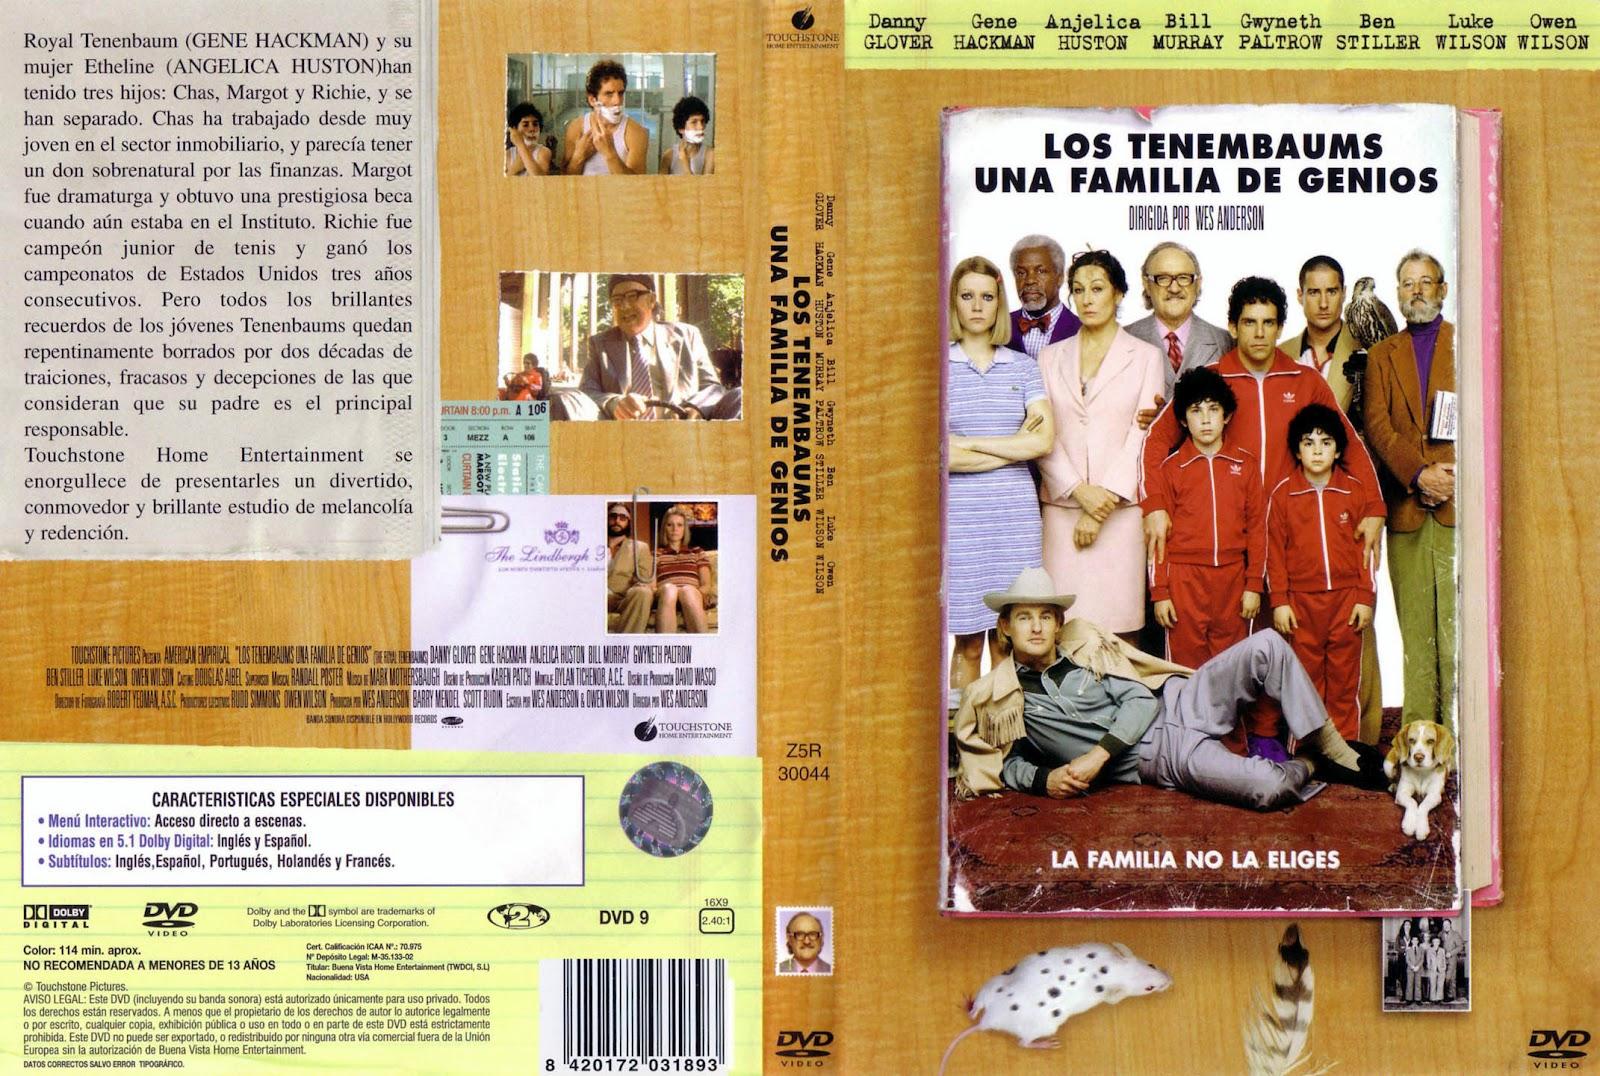 http://3.bp.blogspot.com/-RoGQiQmZcCw/UC5YzQDOxNI/AAAAAAAAEi0/YM4NruyF6-E/s1600/Los_Tenembaums_Una_Familia_De_Genios-Caratula.jpg